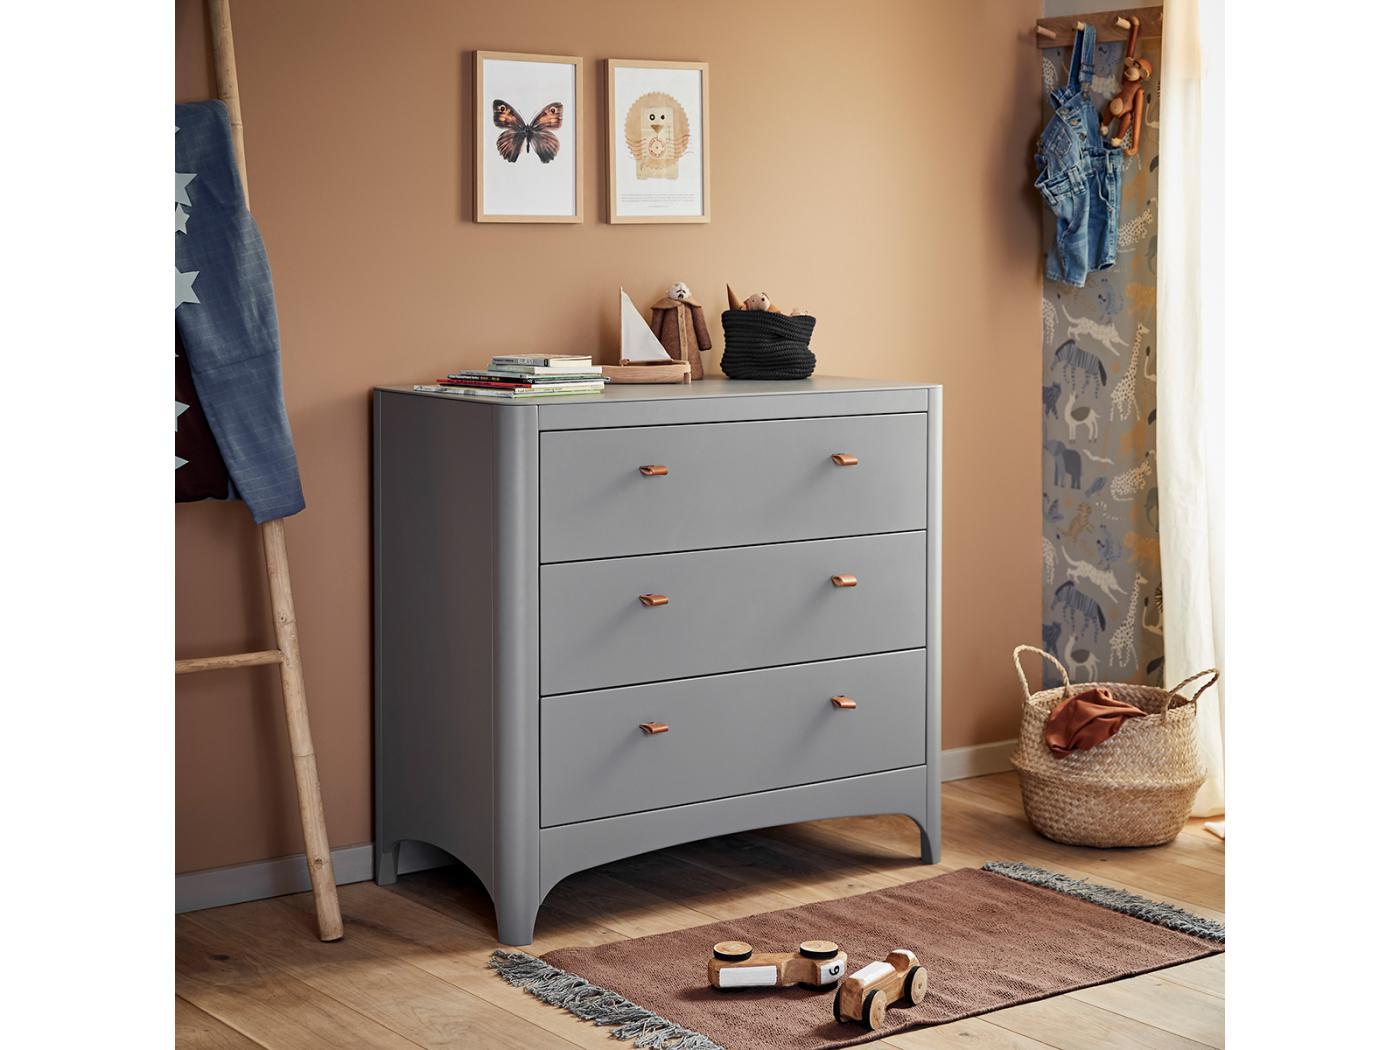 commode 4 tiroirs grise. Black Bedroom Furniture Sets. Home Design Ideas